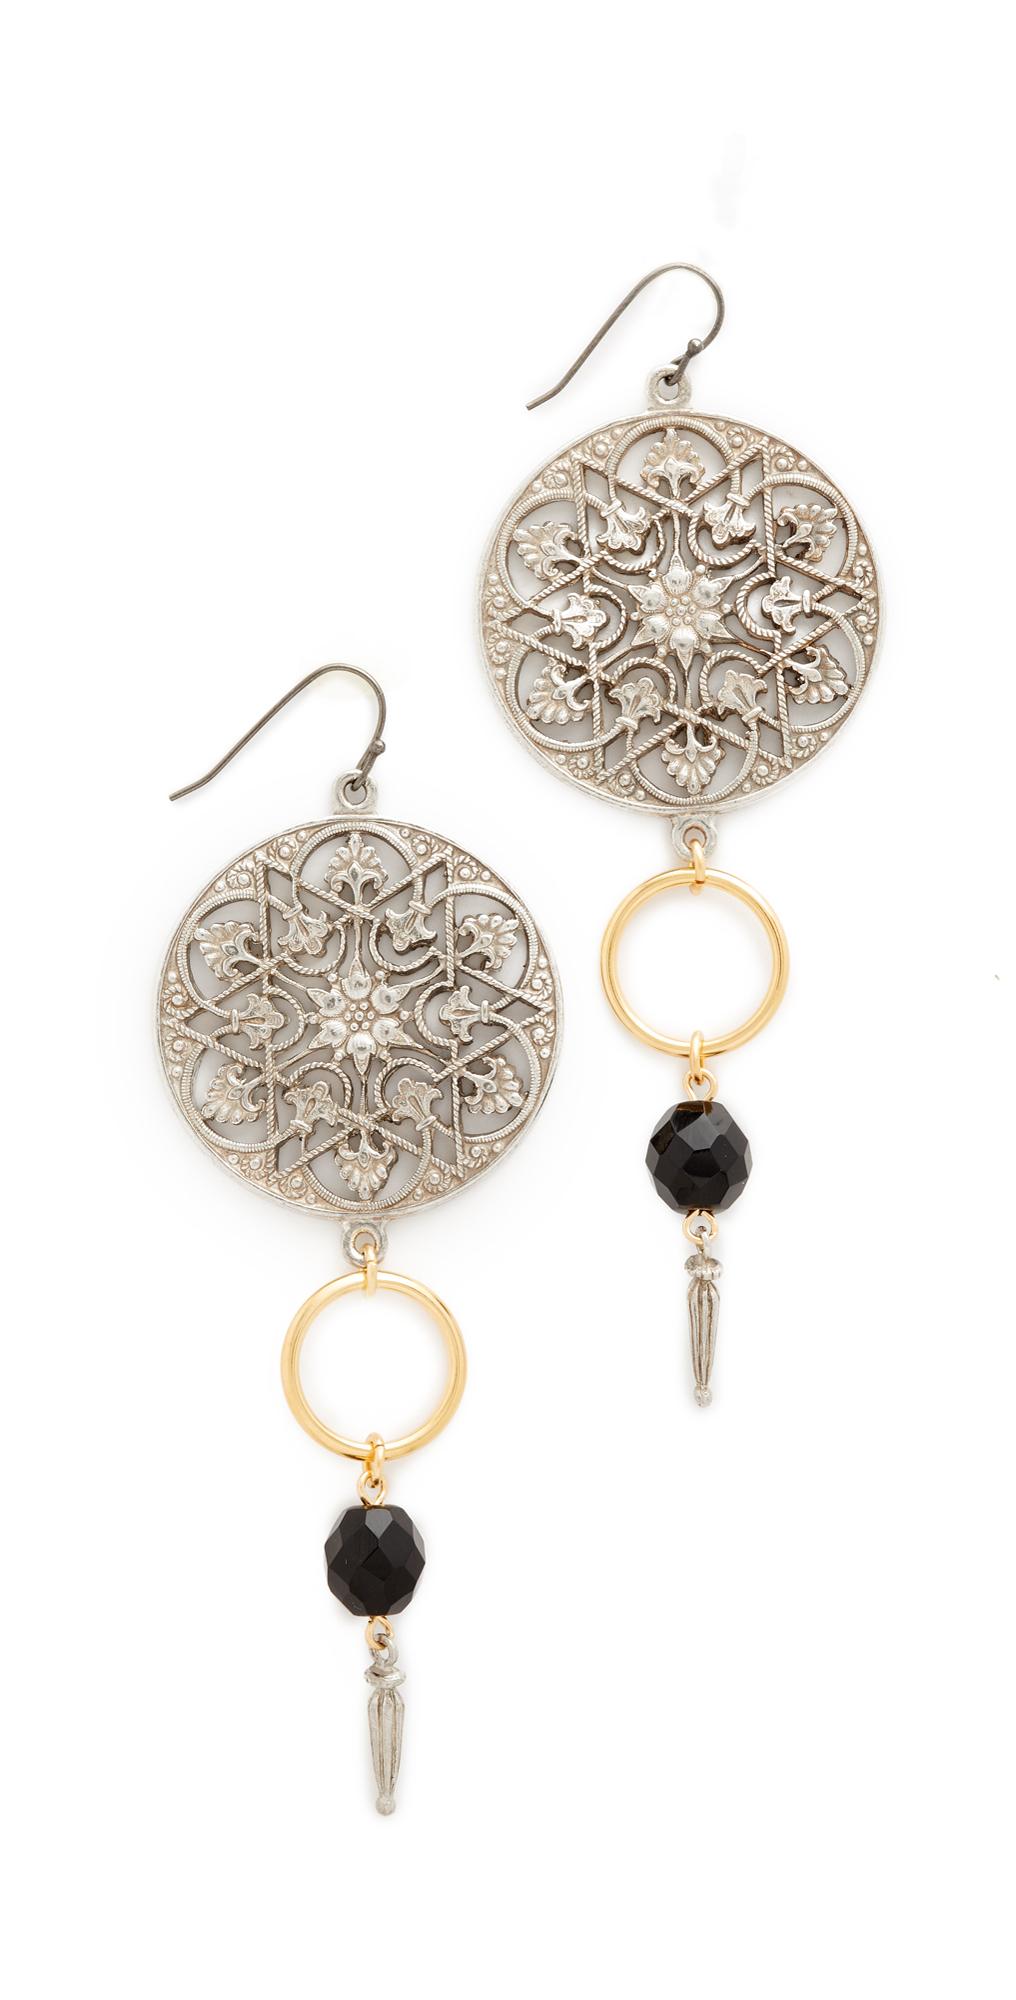 Round Top Drop Single Fishook Earrings Ben-Amun